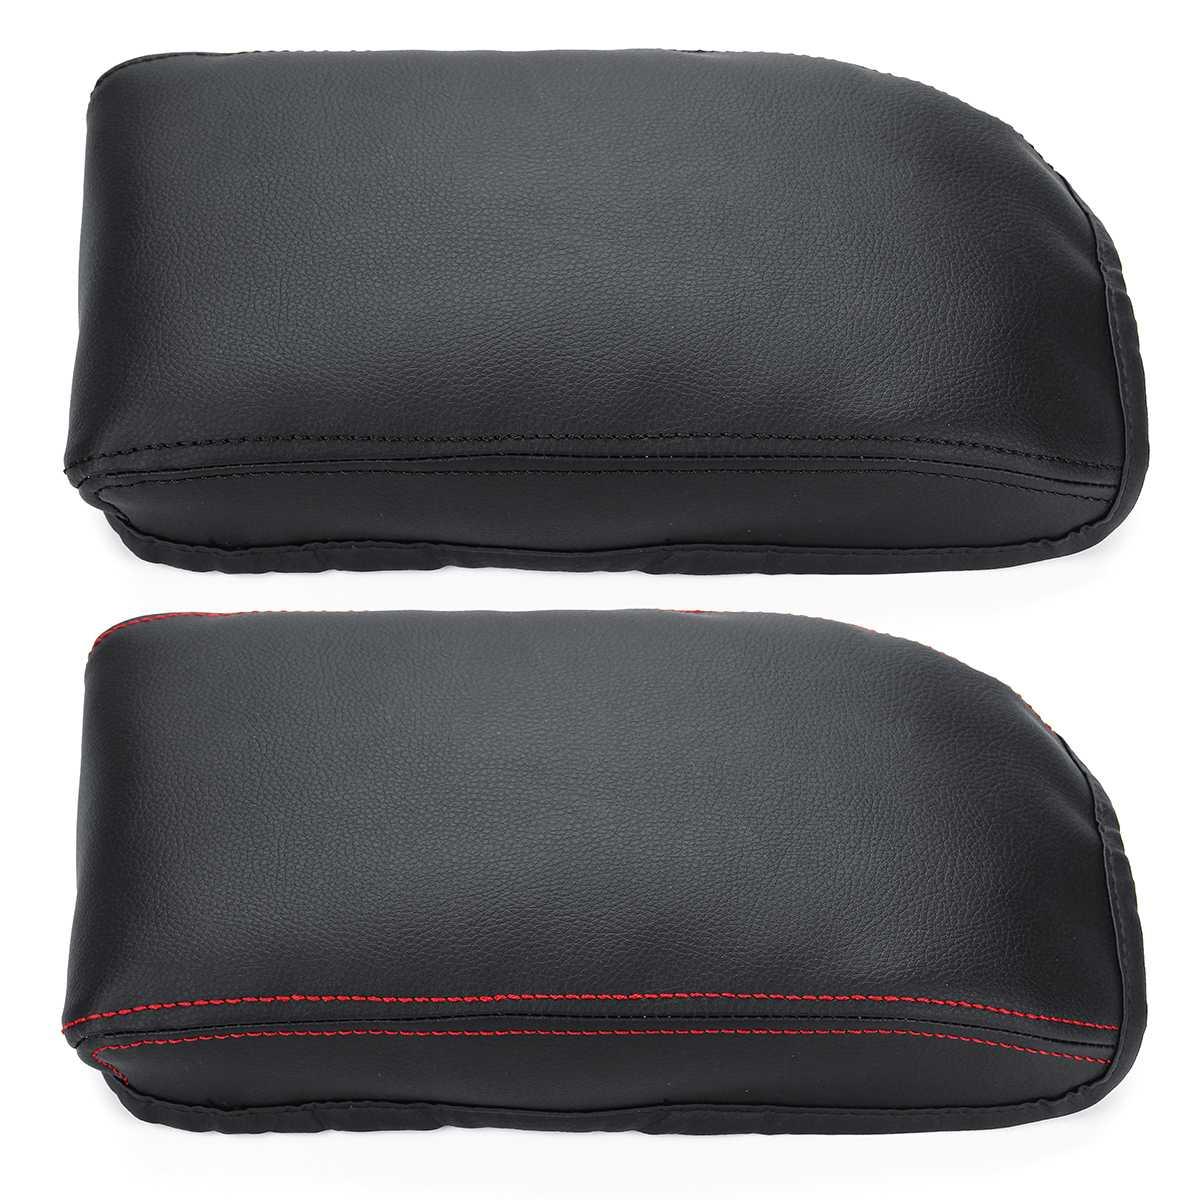 PU Leather Car Center Armrest Arm Rest Box Case Cover Cushion Pad For Skoda Octavia A7 2015 2016 2017 2018